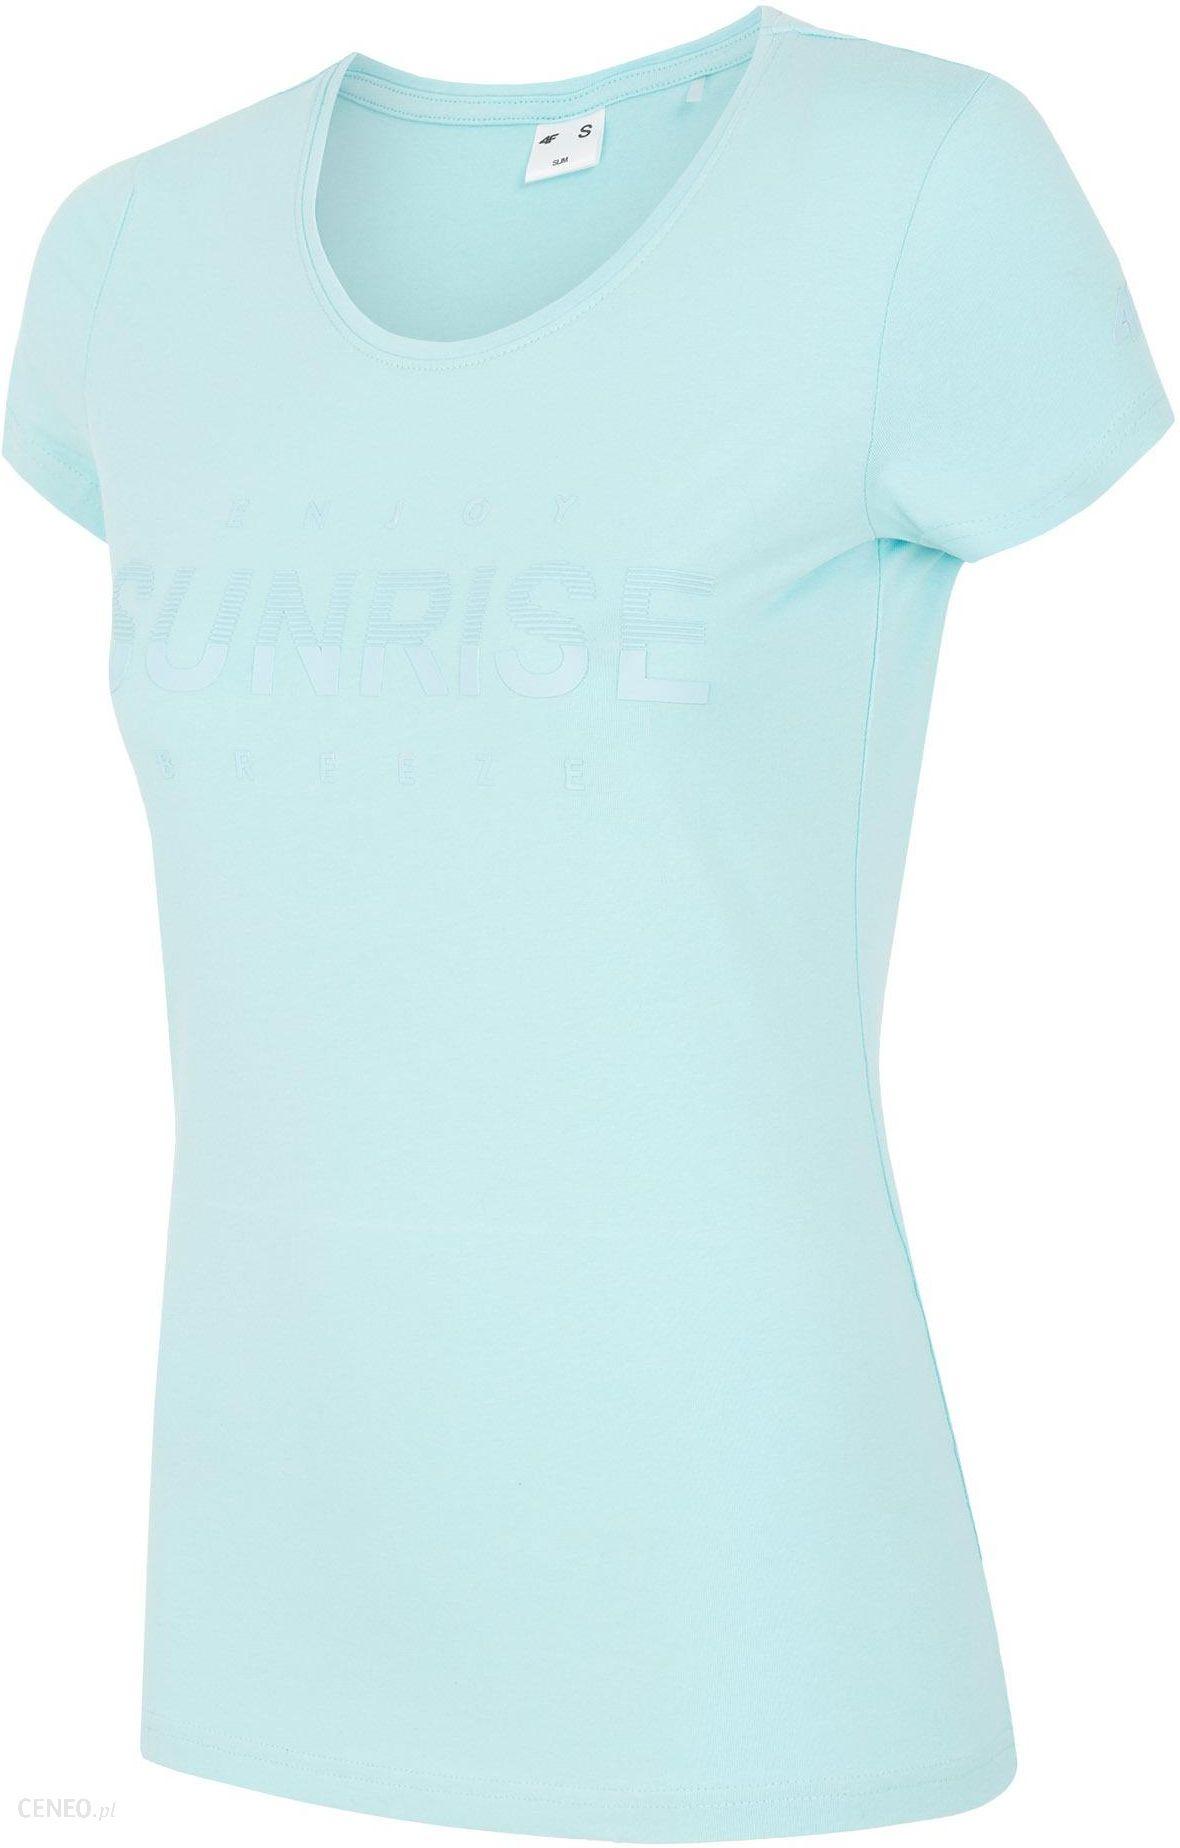 c26e9496d0647c 4F T-shirt damski TSD453 - mięta - Ceny i opinie - Ceneo.pl